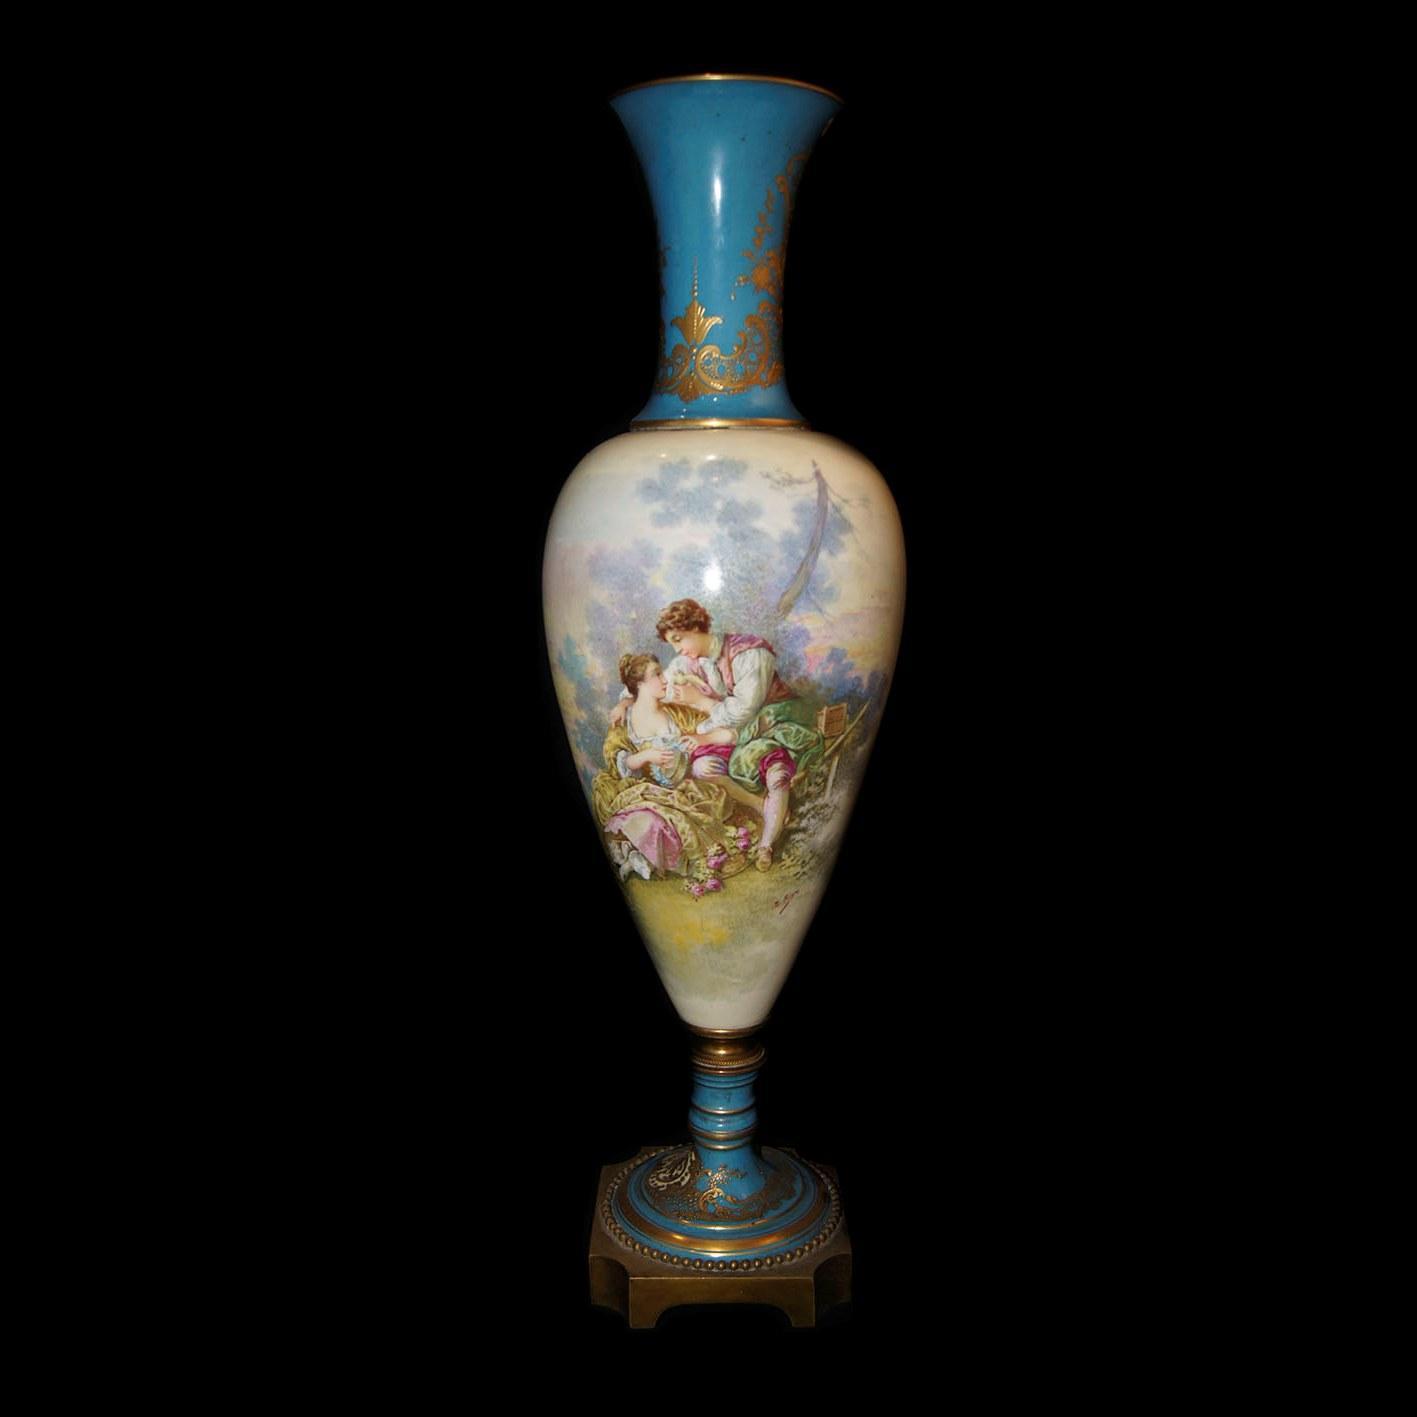 антикварная высокая ваза. sevres. франция